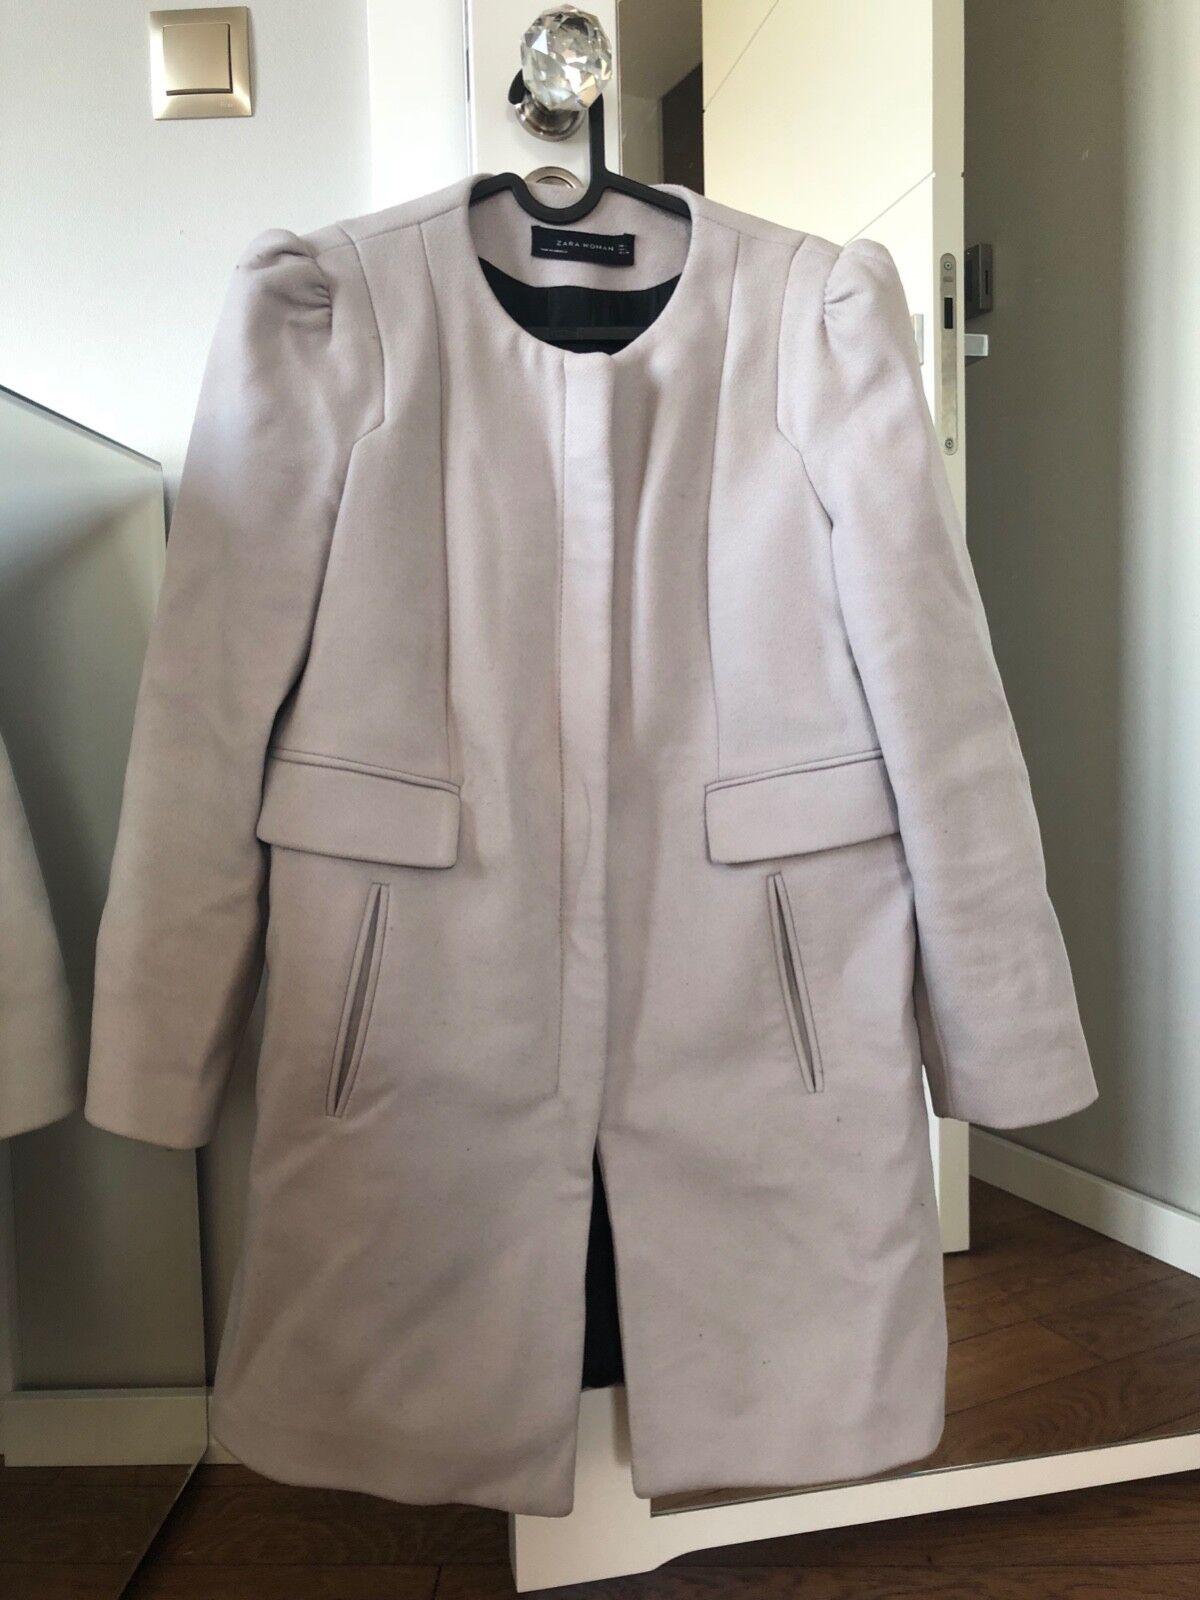 ZARA light grey coat size L